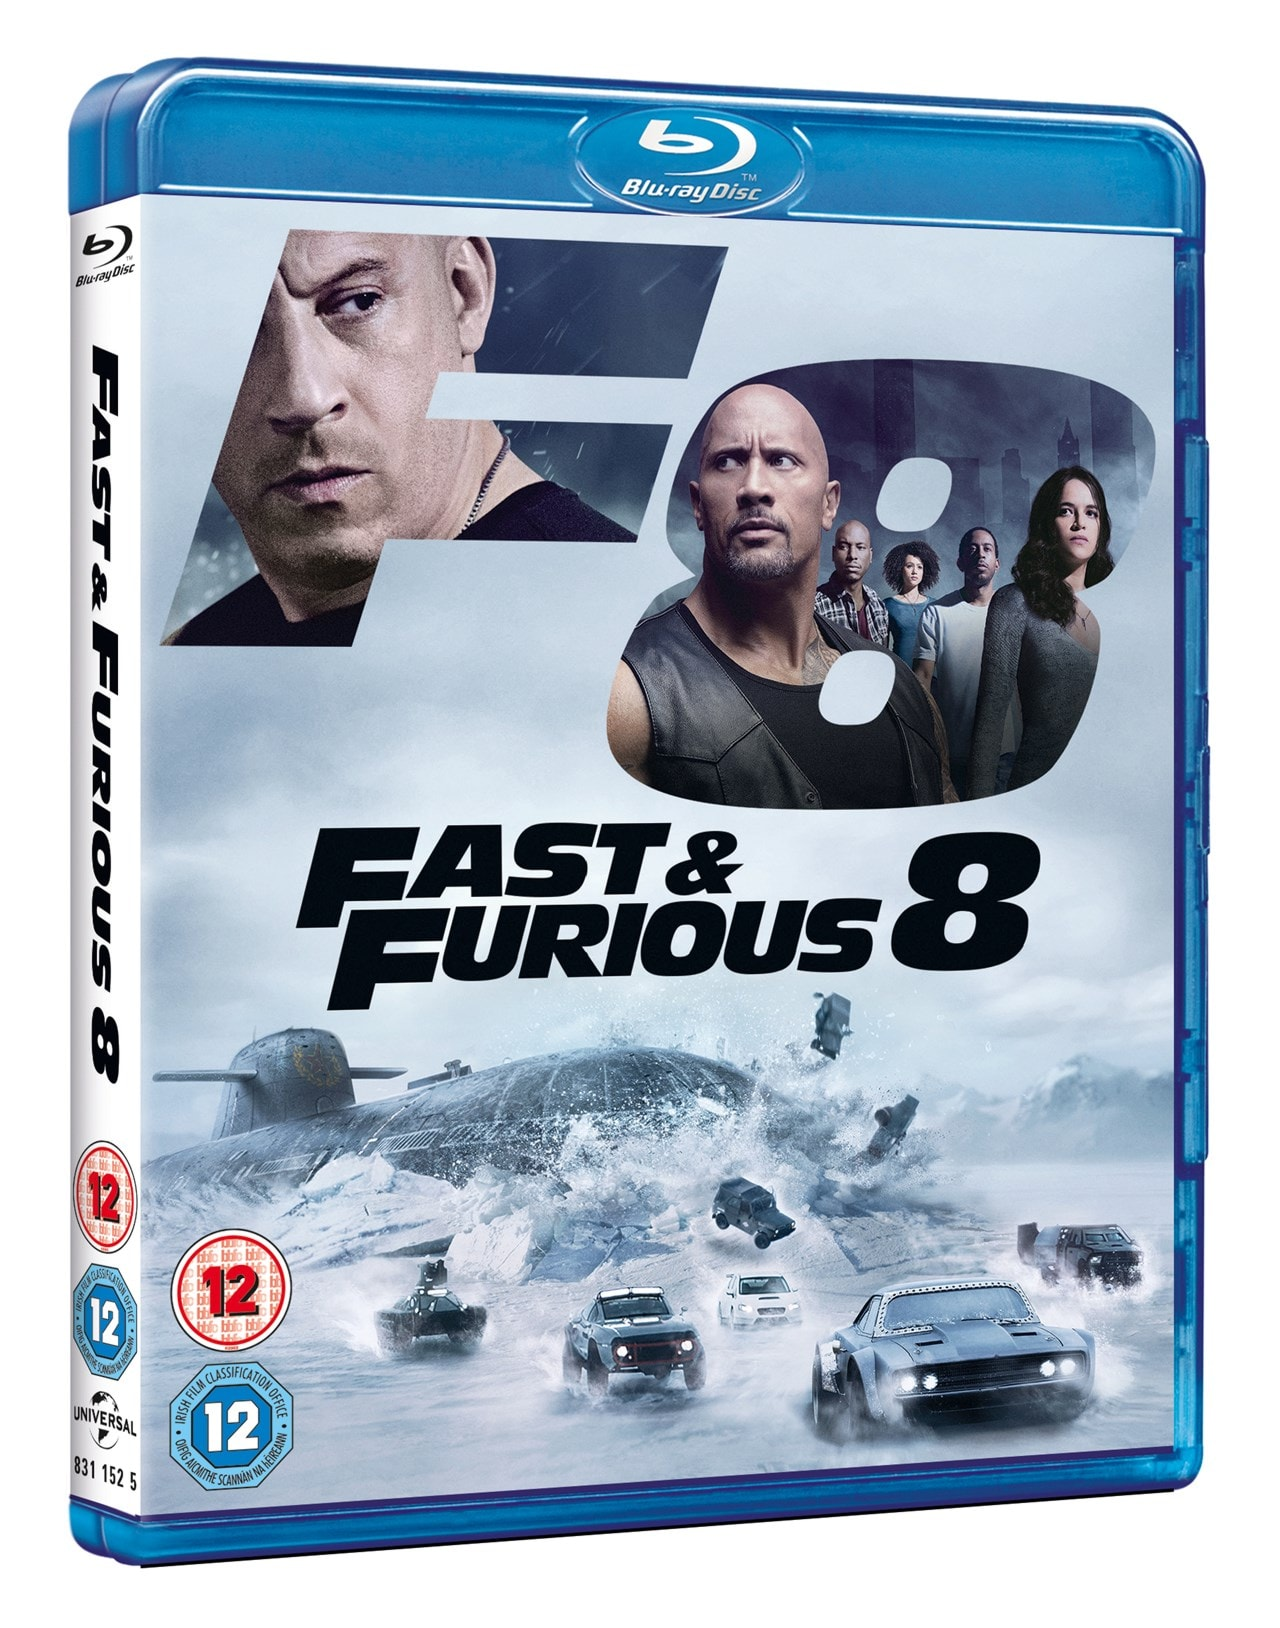 Fast & Furious 8 - 2